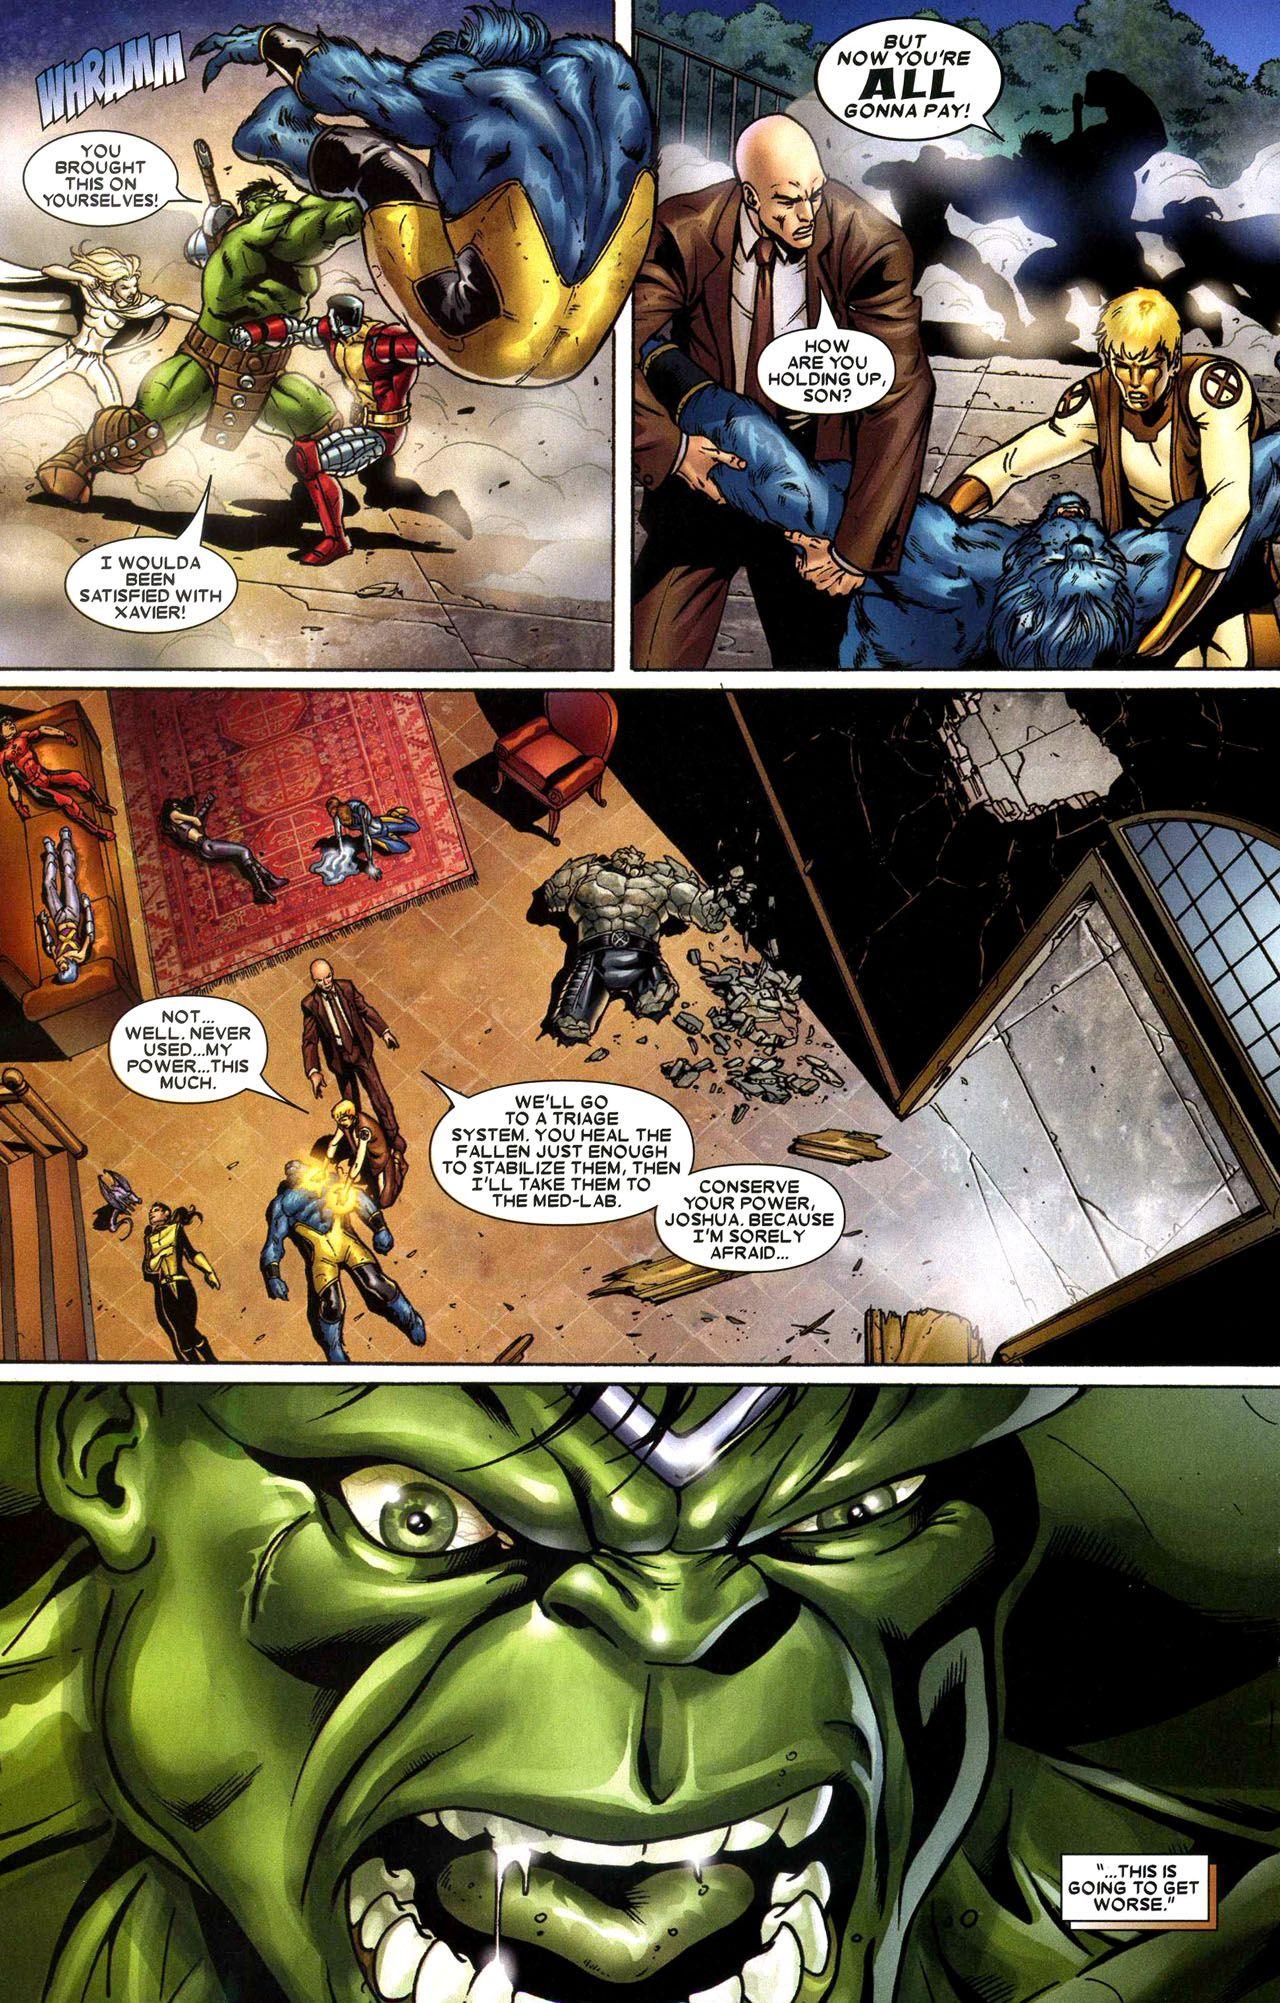 The Incredible Hulk Vs The X Men World War Hulk Lowbrowcomics World War Hulk Incredible Hulk The Incredibles